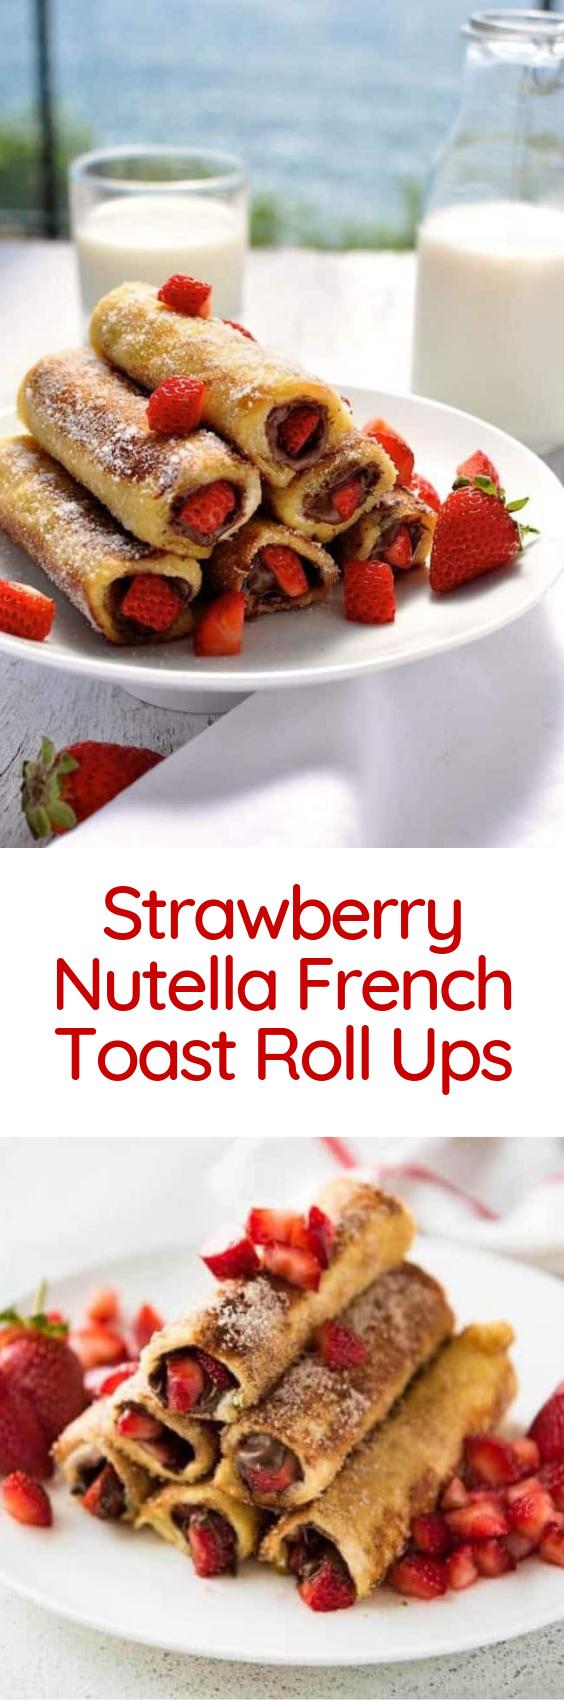 Strawberry Nutella French Toast Roll Ups (Dengan gambar)